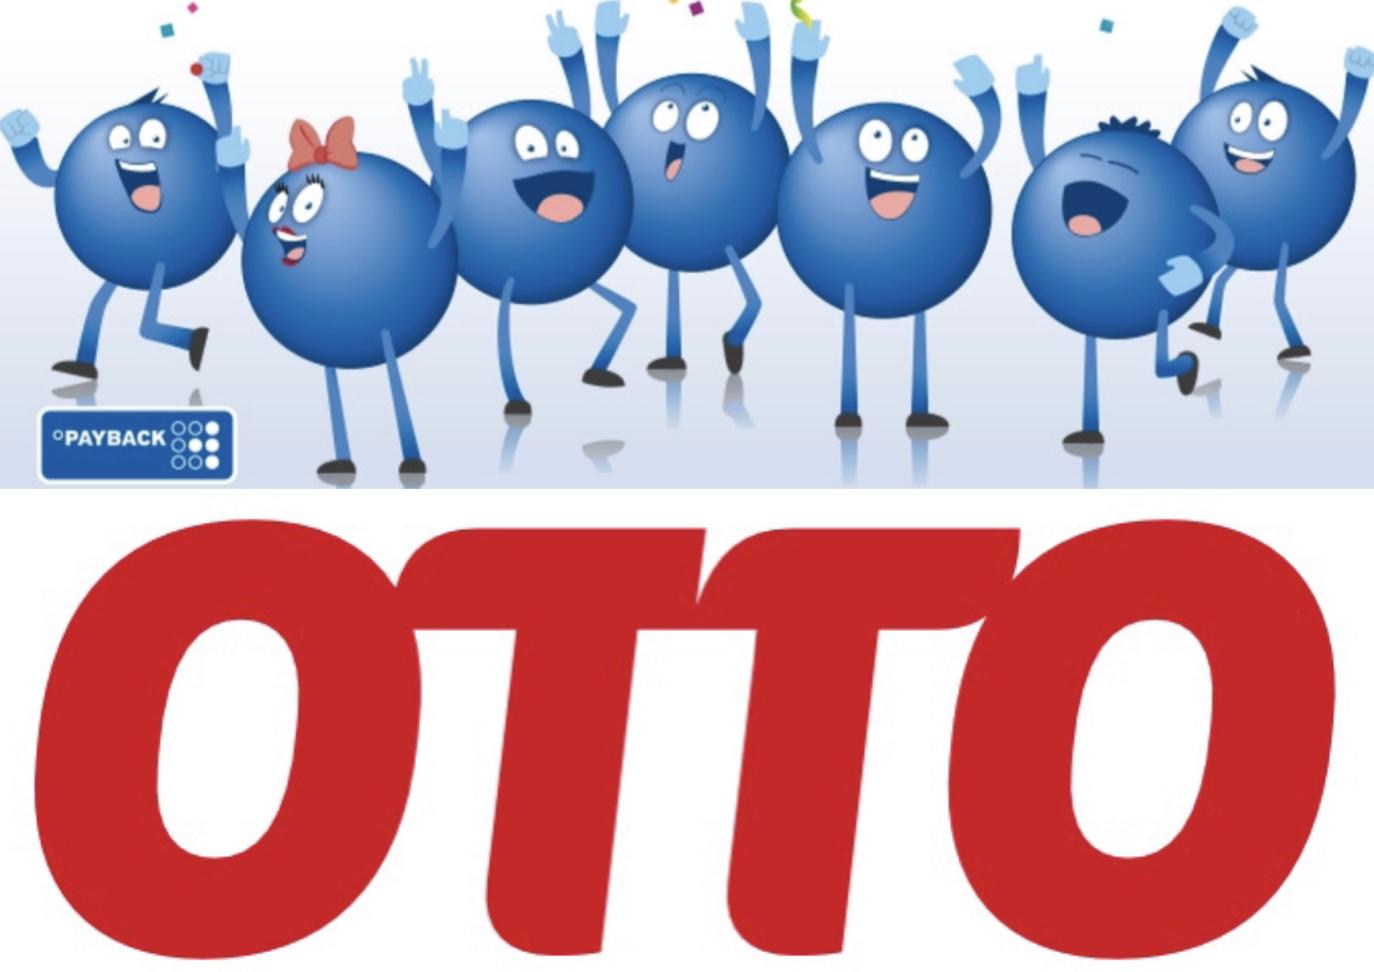 Mobile Monday: 15-fach Payback Punkte bei OTTO - nur heute ...